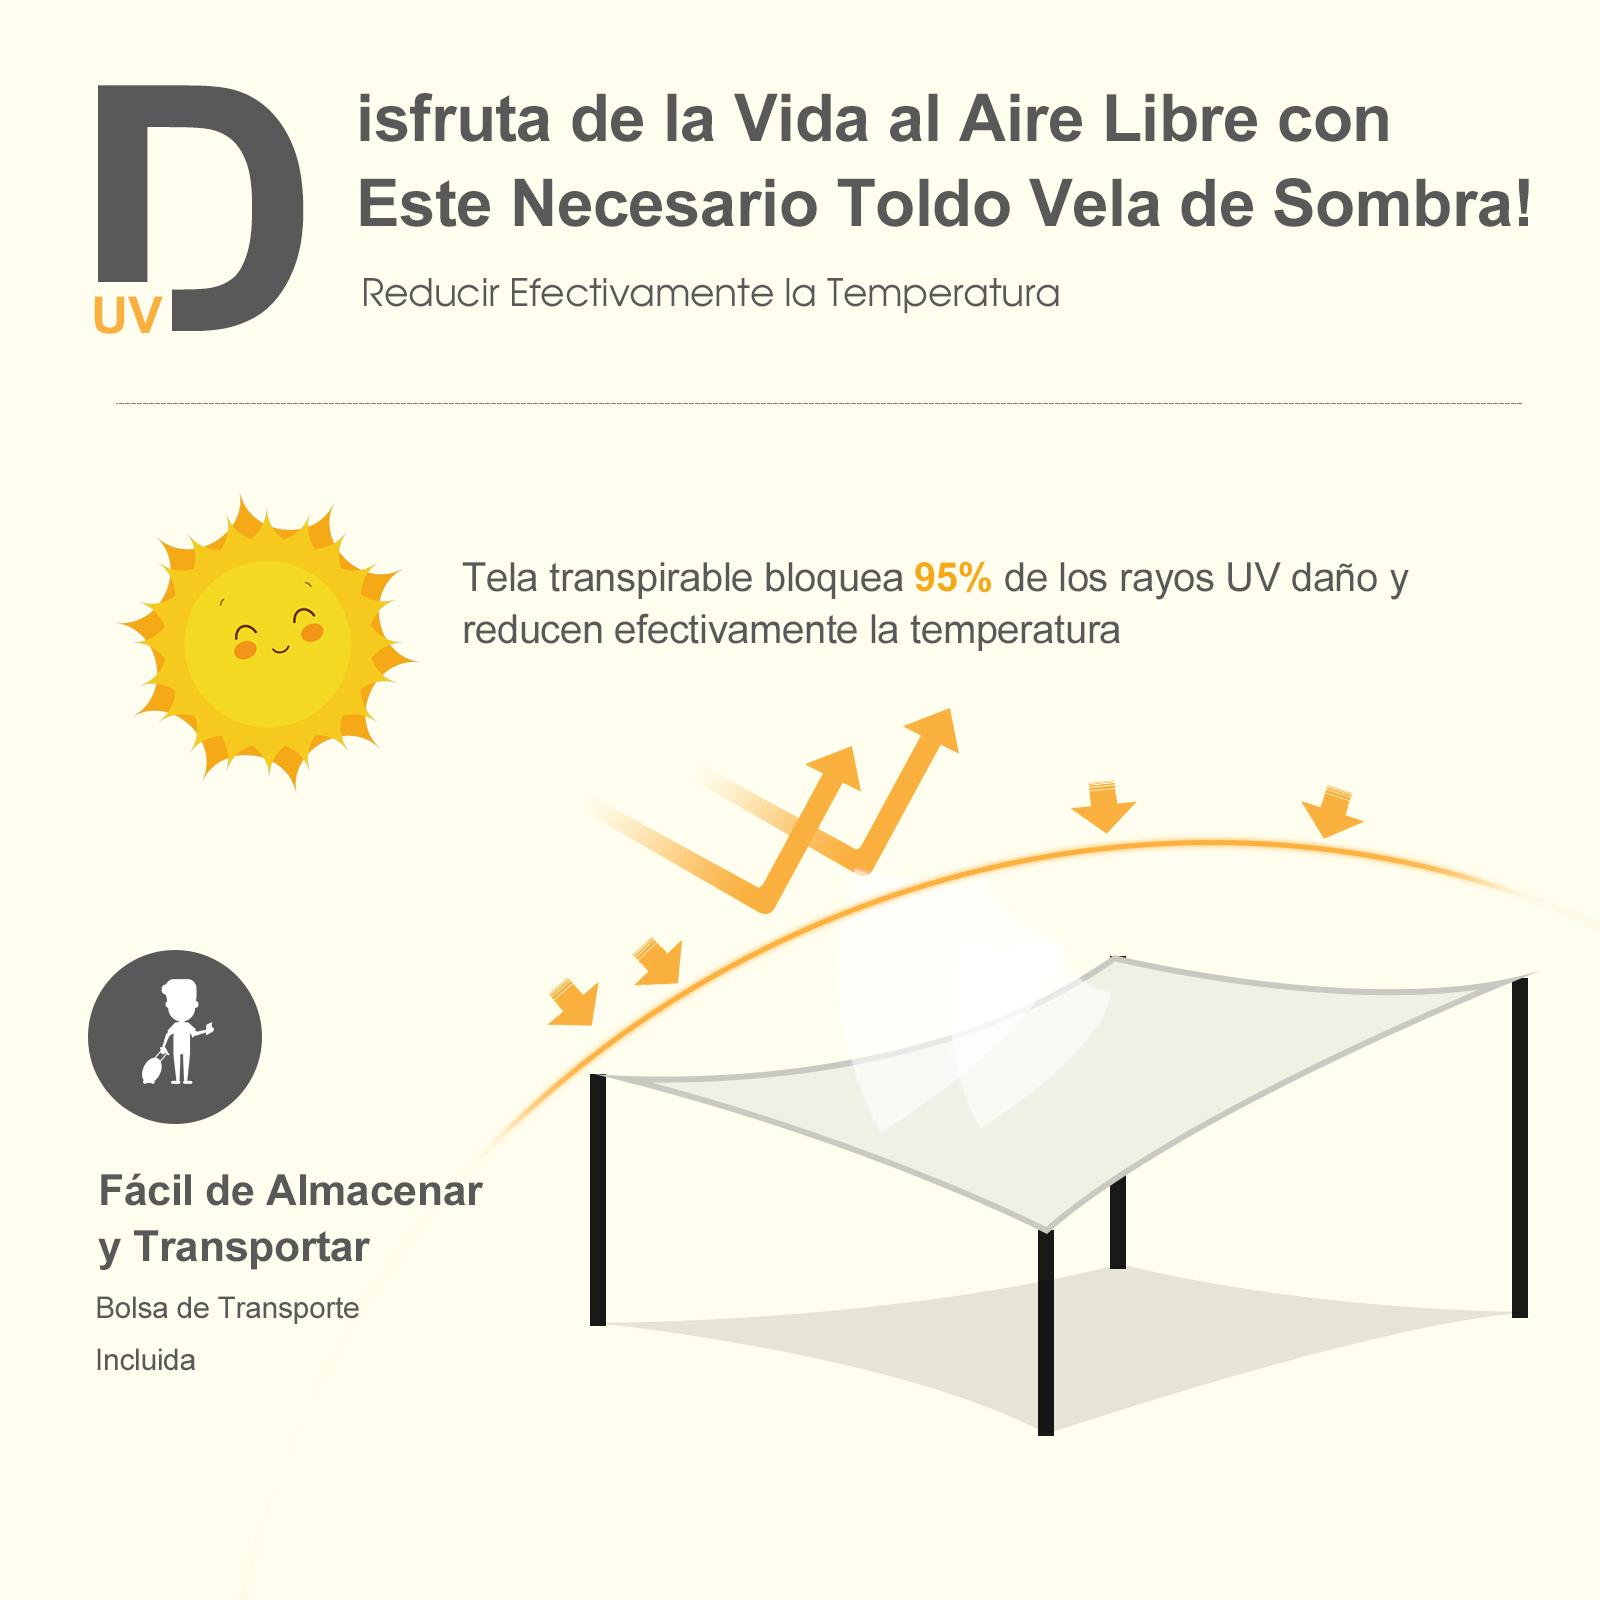 Toldo-de-Vela-Rectangular-para-Jardin-y-Exterior-Repelente-al-Agua-Proteccion-UV miniatura 14